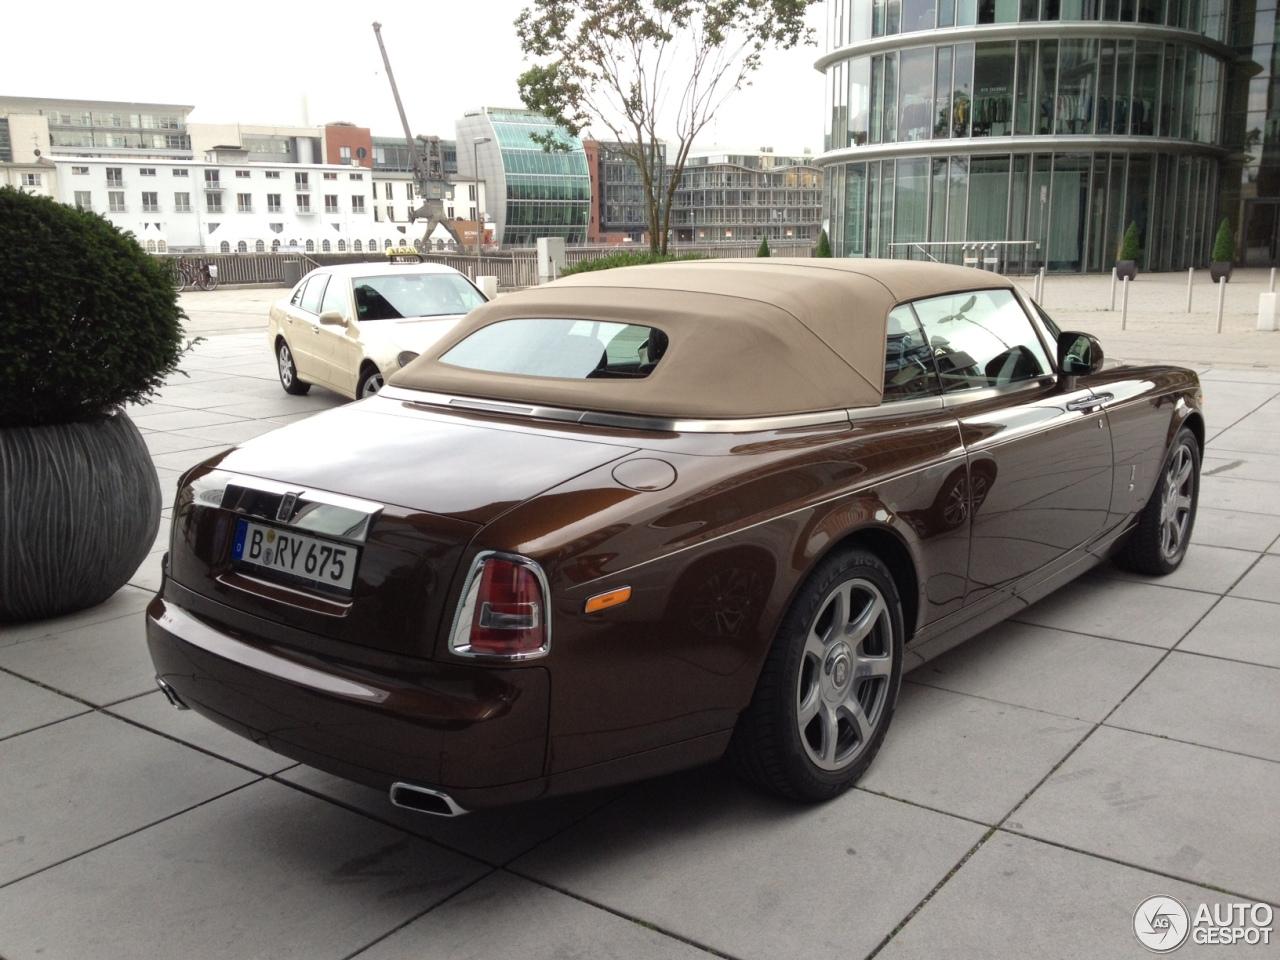 Rolls royce phantom drophead coup 23 june 2013 autogespot - Rolls royce drophead coupe ...